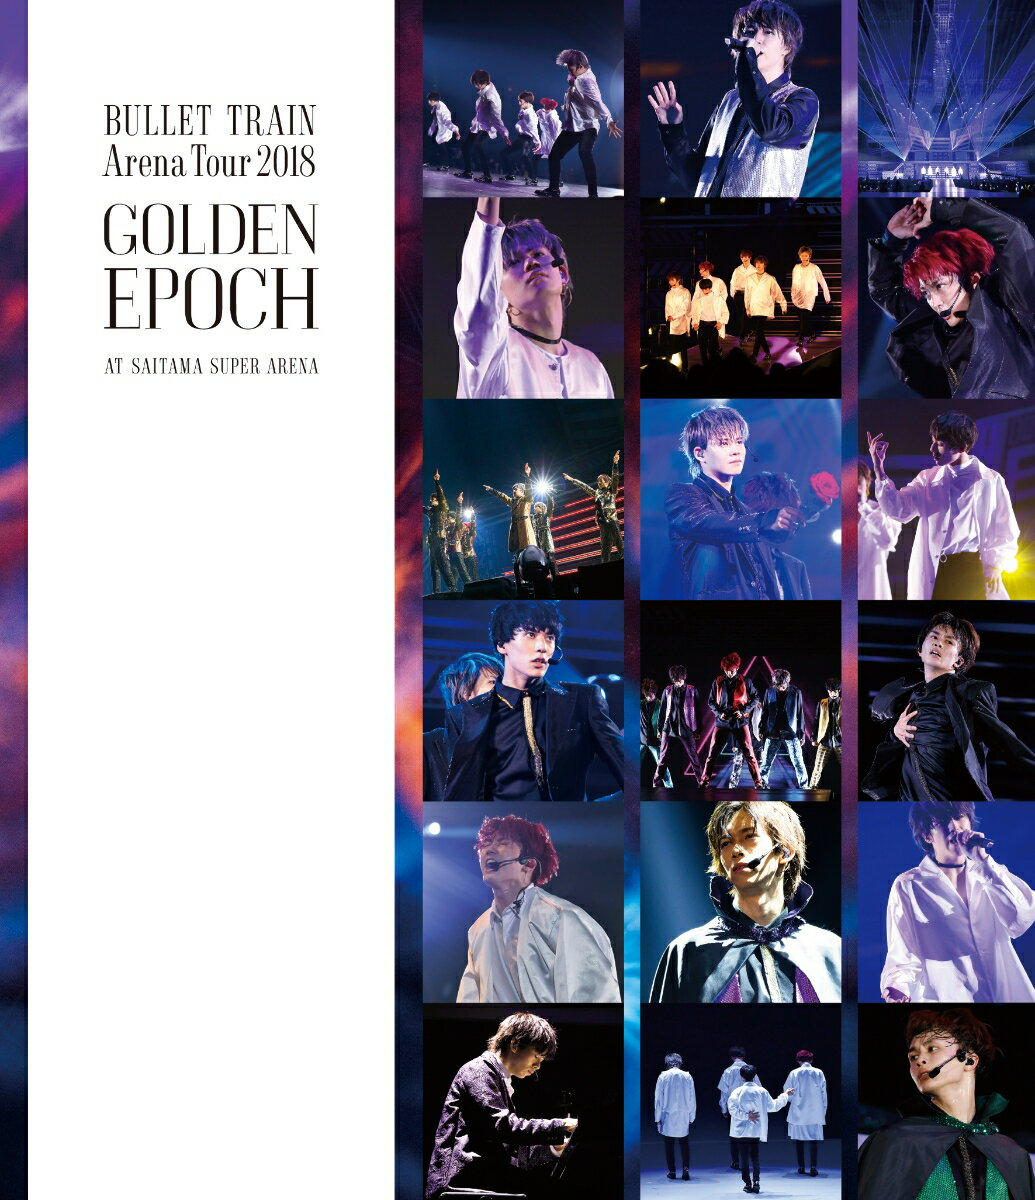 BULLET TRAIN ARENA TOUR 2018 GOLDEN EPOCH at SAITAMA SUPER ARENA【Blu-ray】